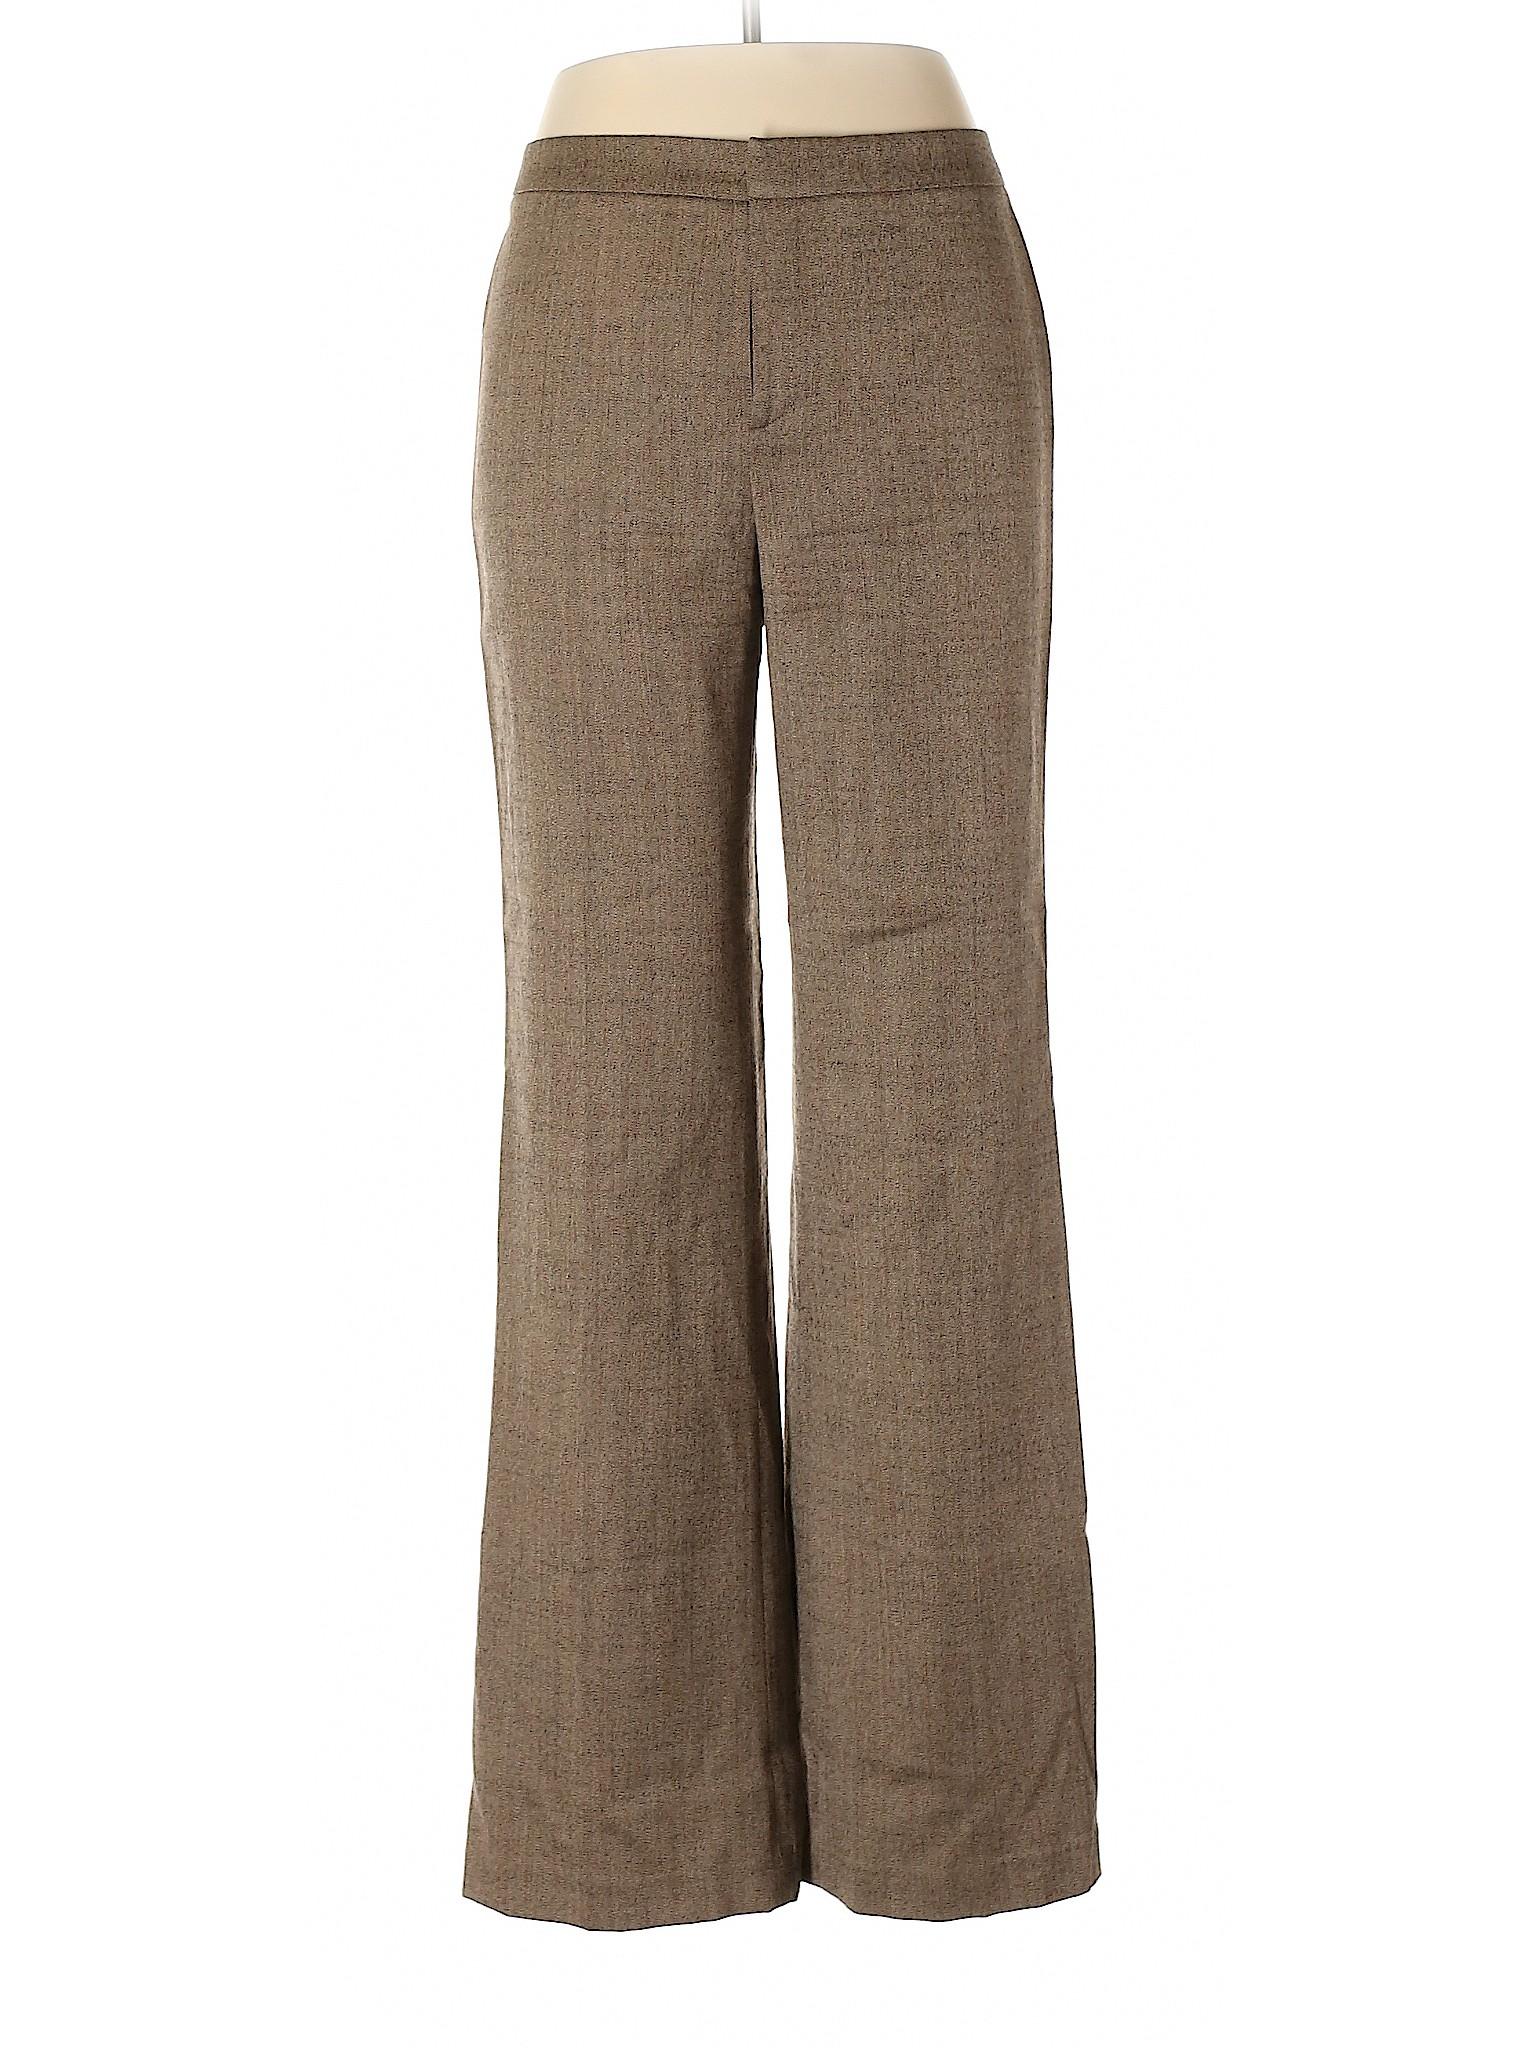 Dana Buchman Womens Brown// Black~1X to 3X Pants~$60~NWT